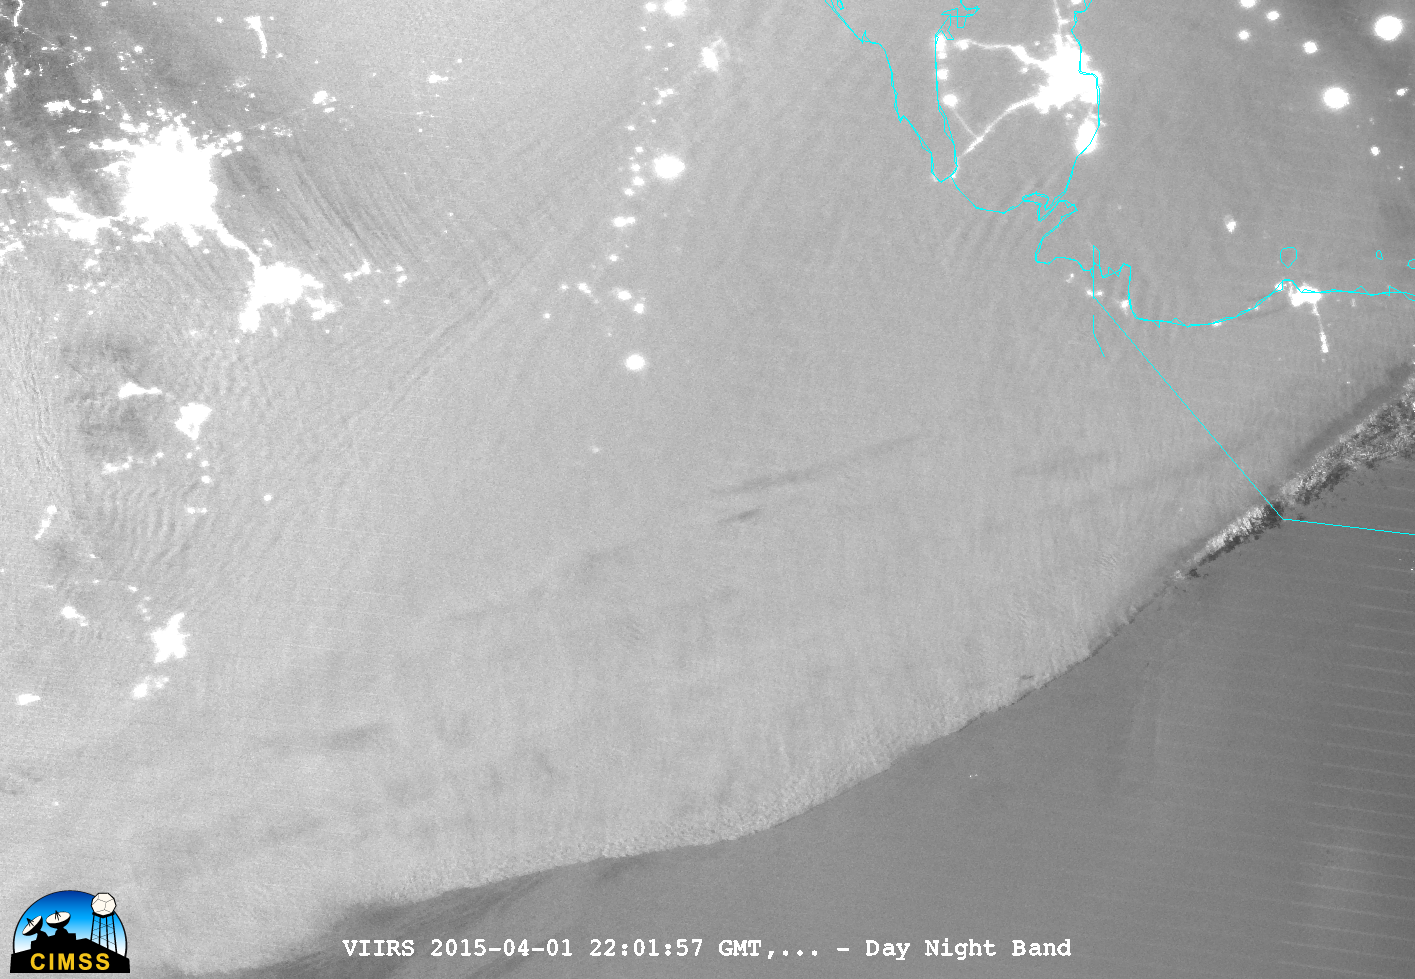 Suomi NPP VIIRS 0.7 µm Day/Night Band image